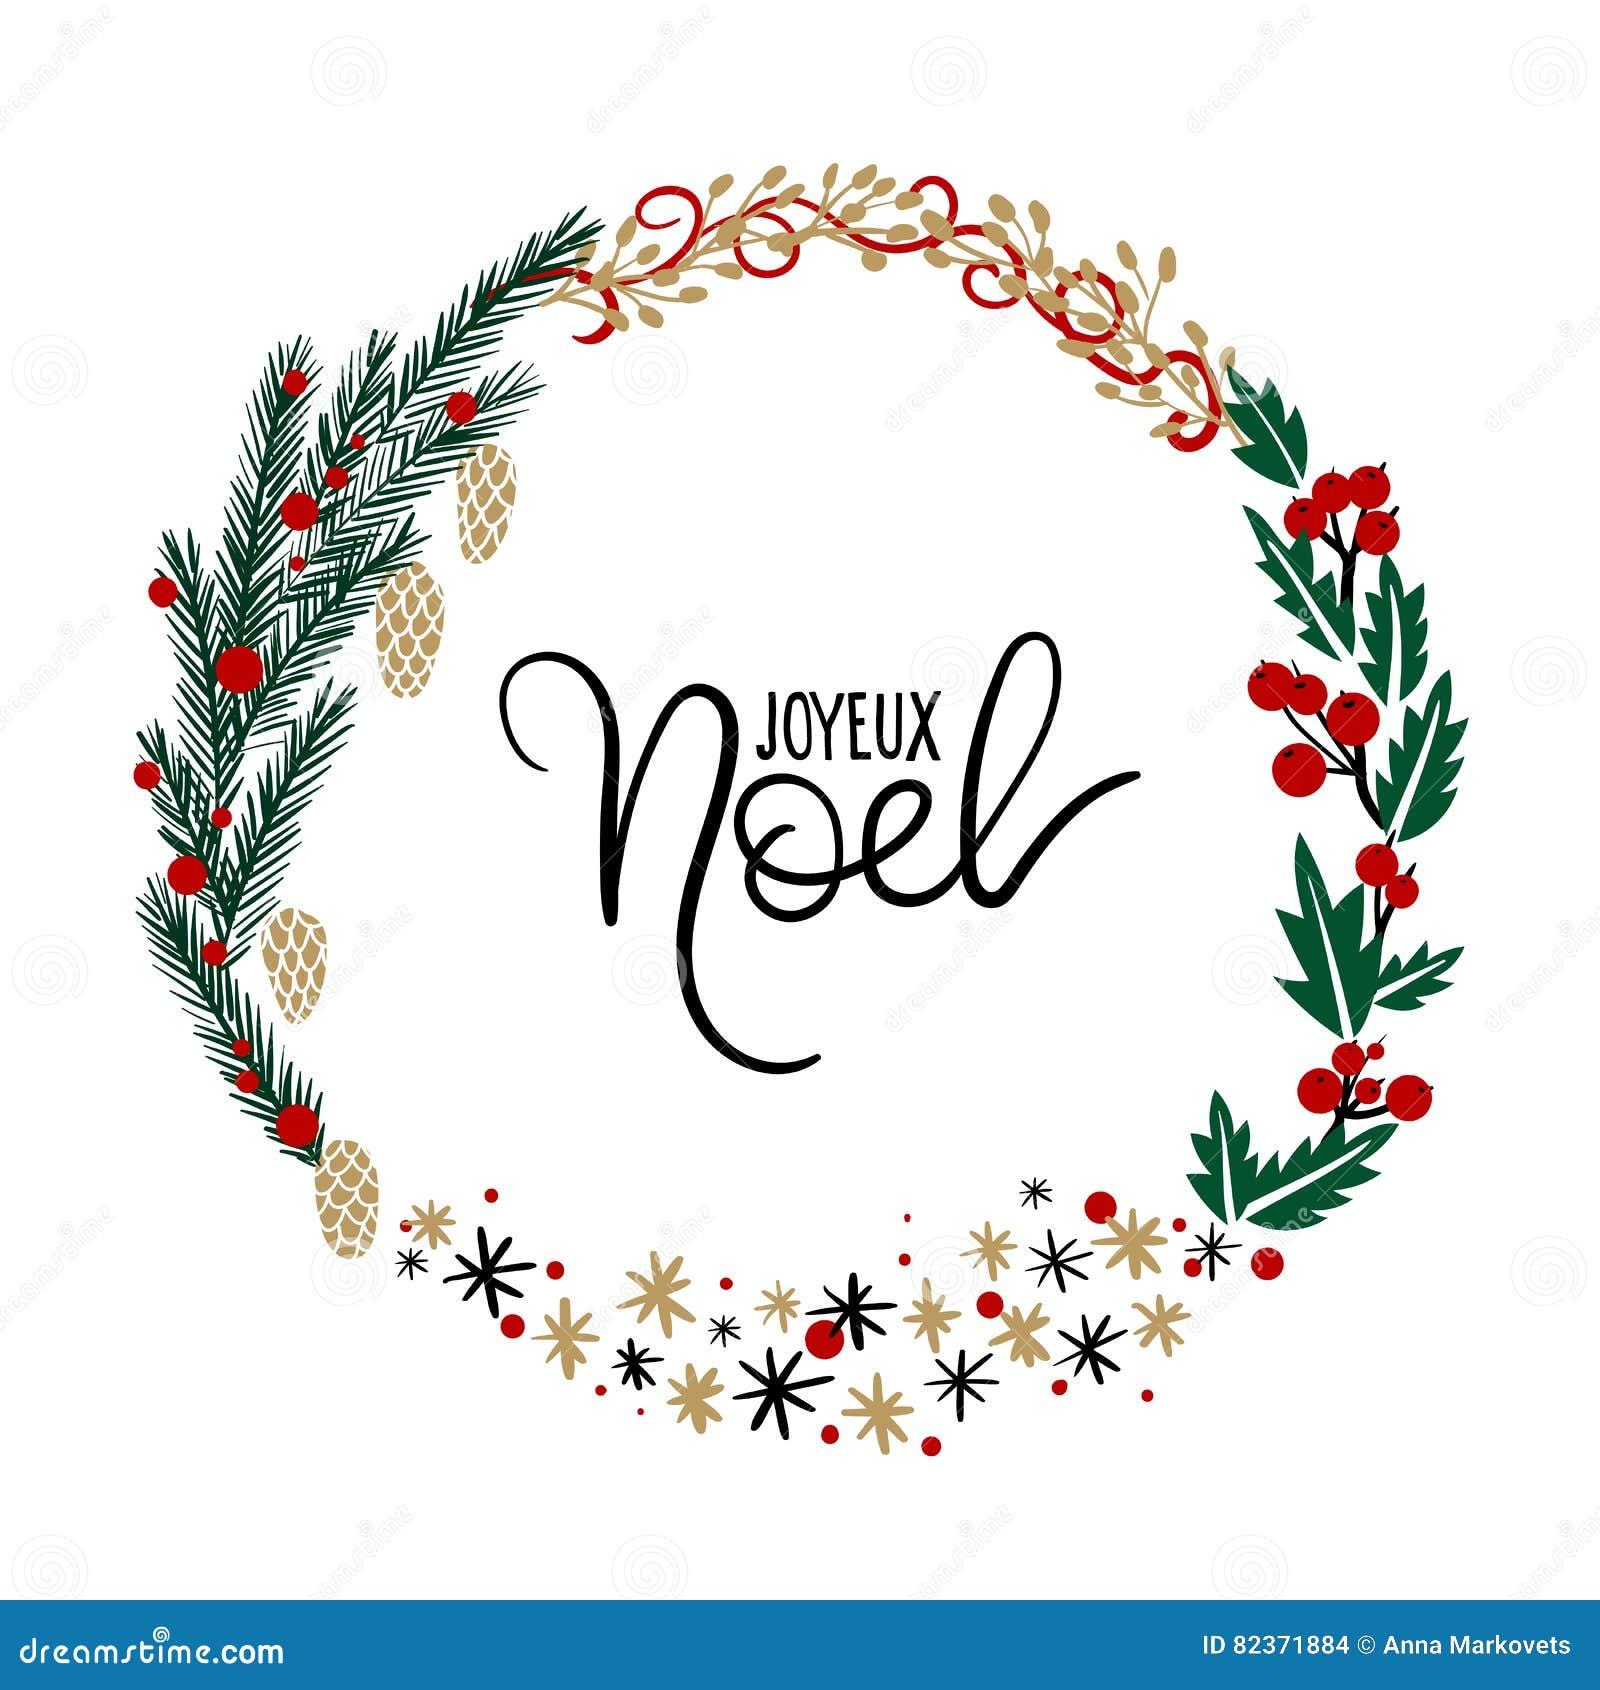 joyeux noel hand lettering greeting card christmas wreath stock